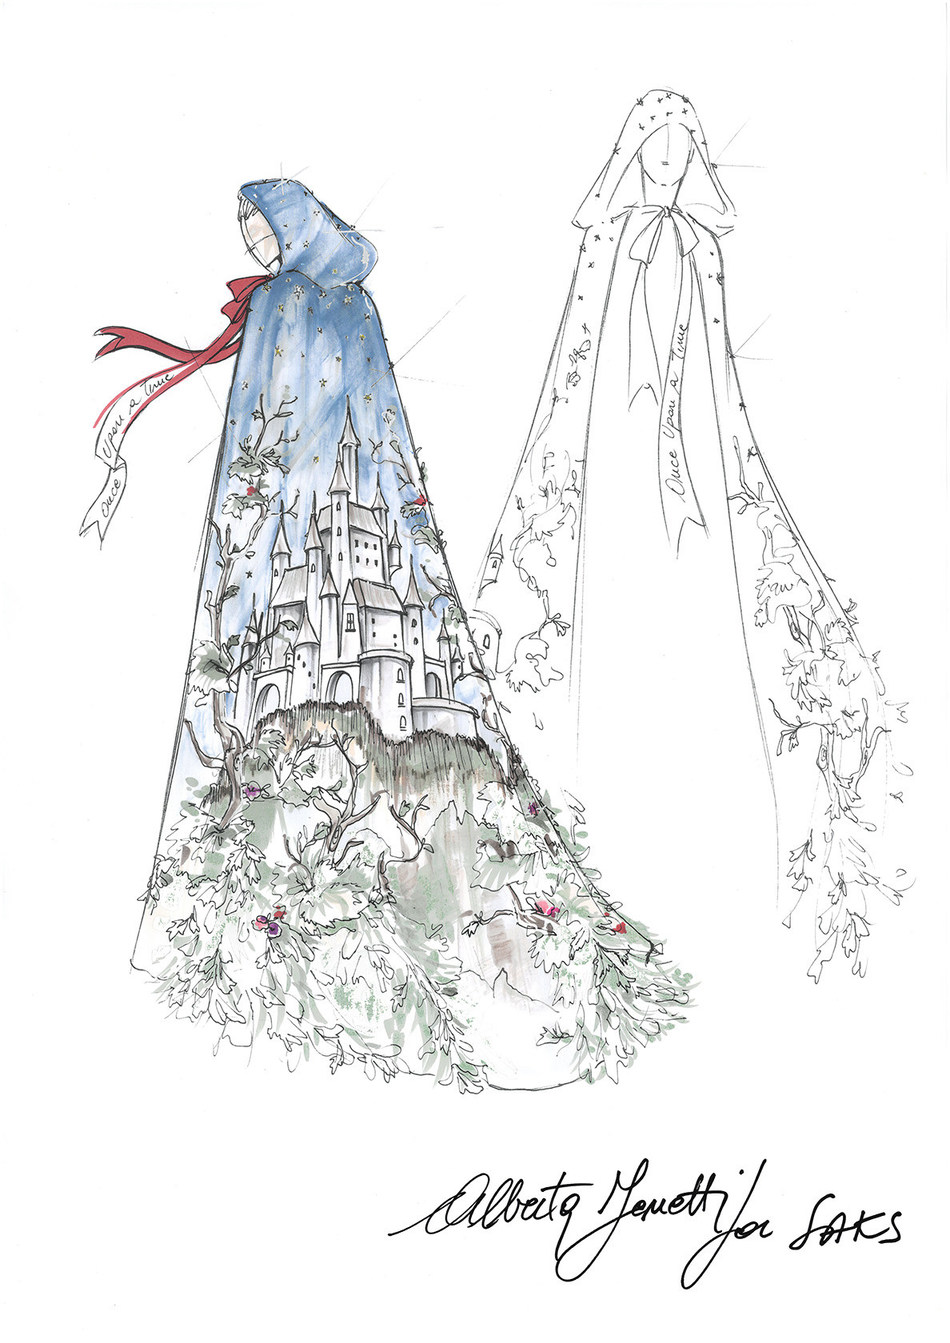 Alberta Ferretti one-of-a-kind fairytale gown sketch for Saks Fifth Avenue